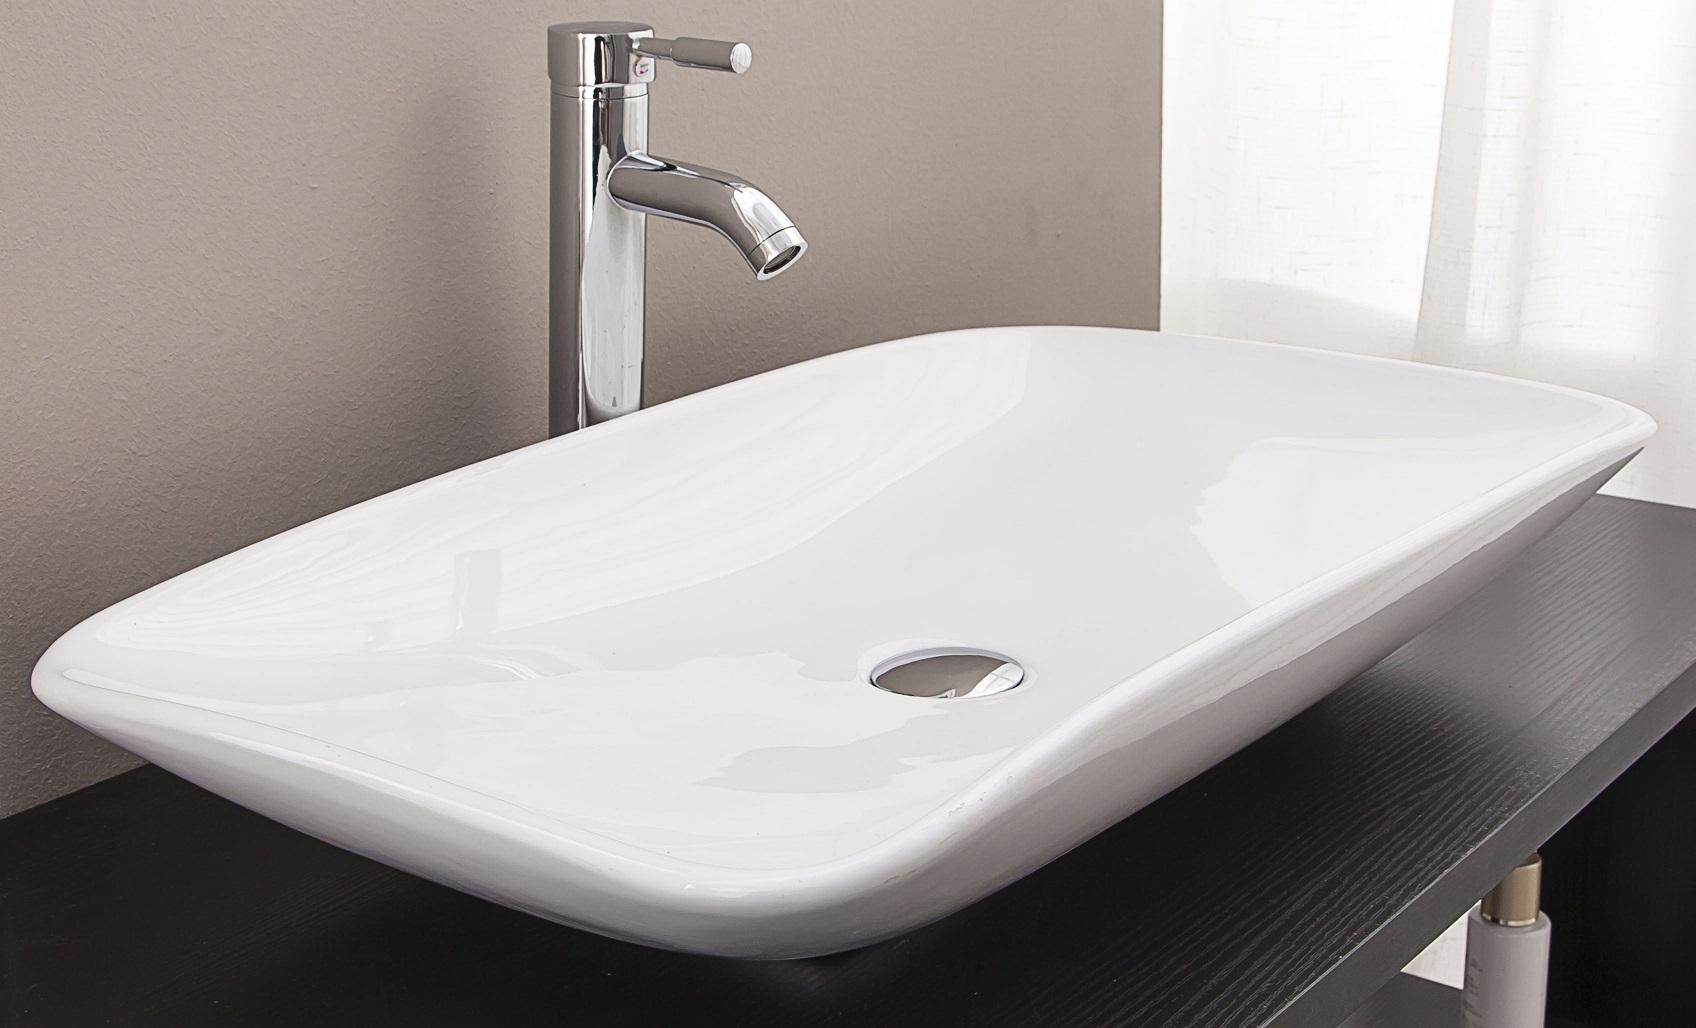 Bathroom Ceramic Rectangular Above Countertop Basin for Vanity  Z2470